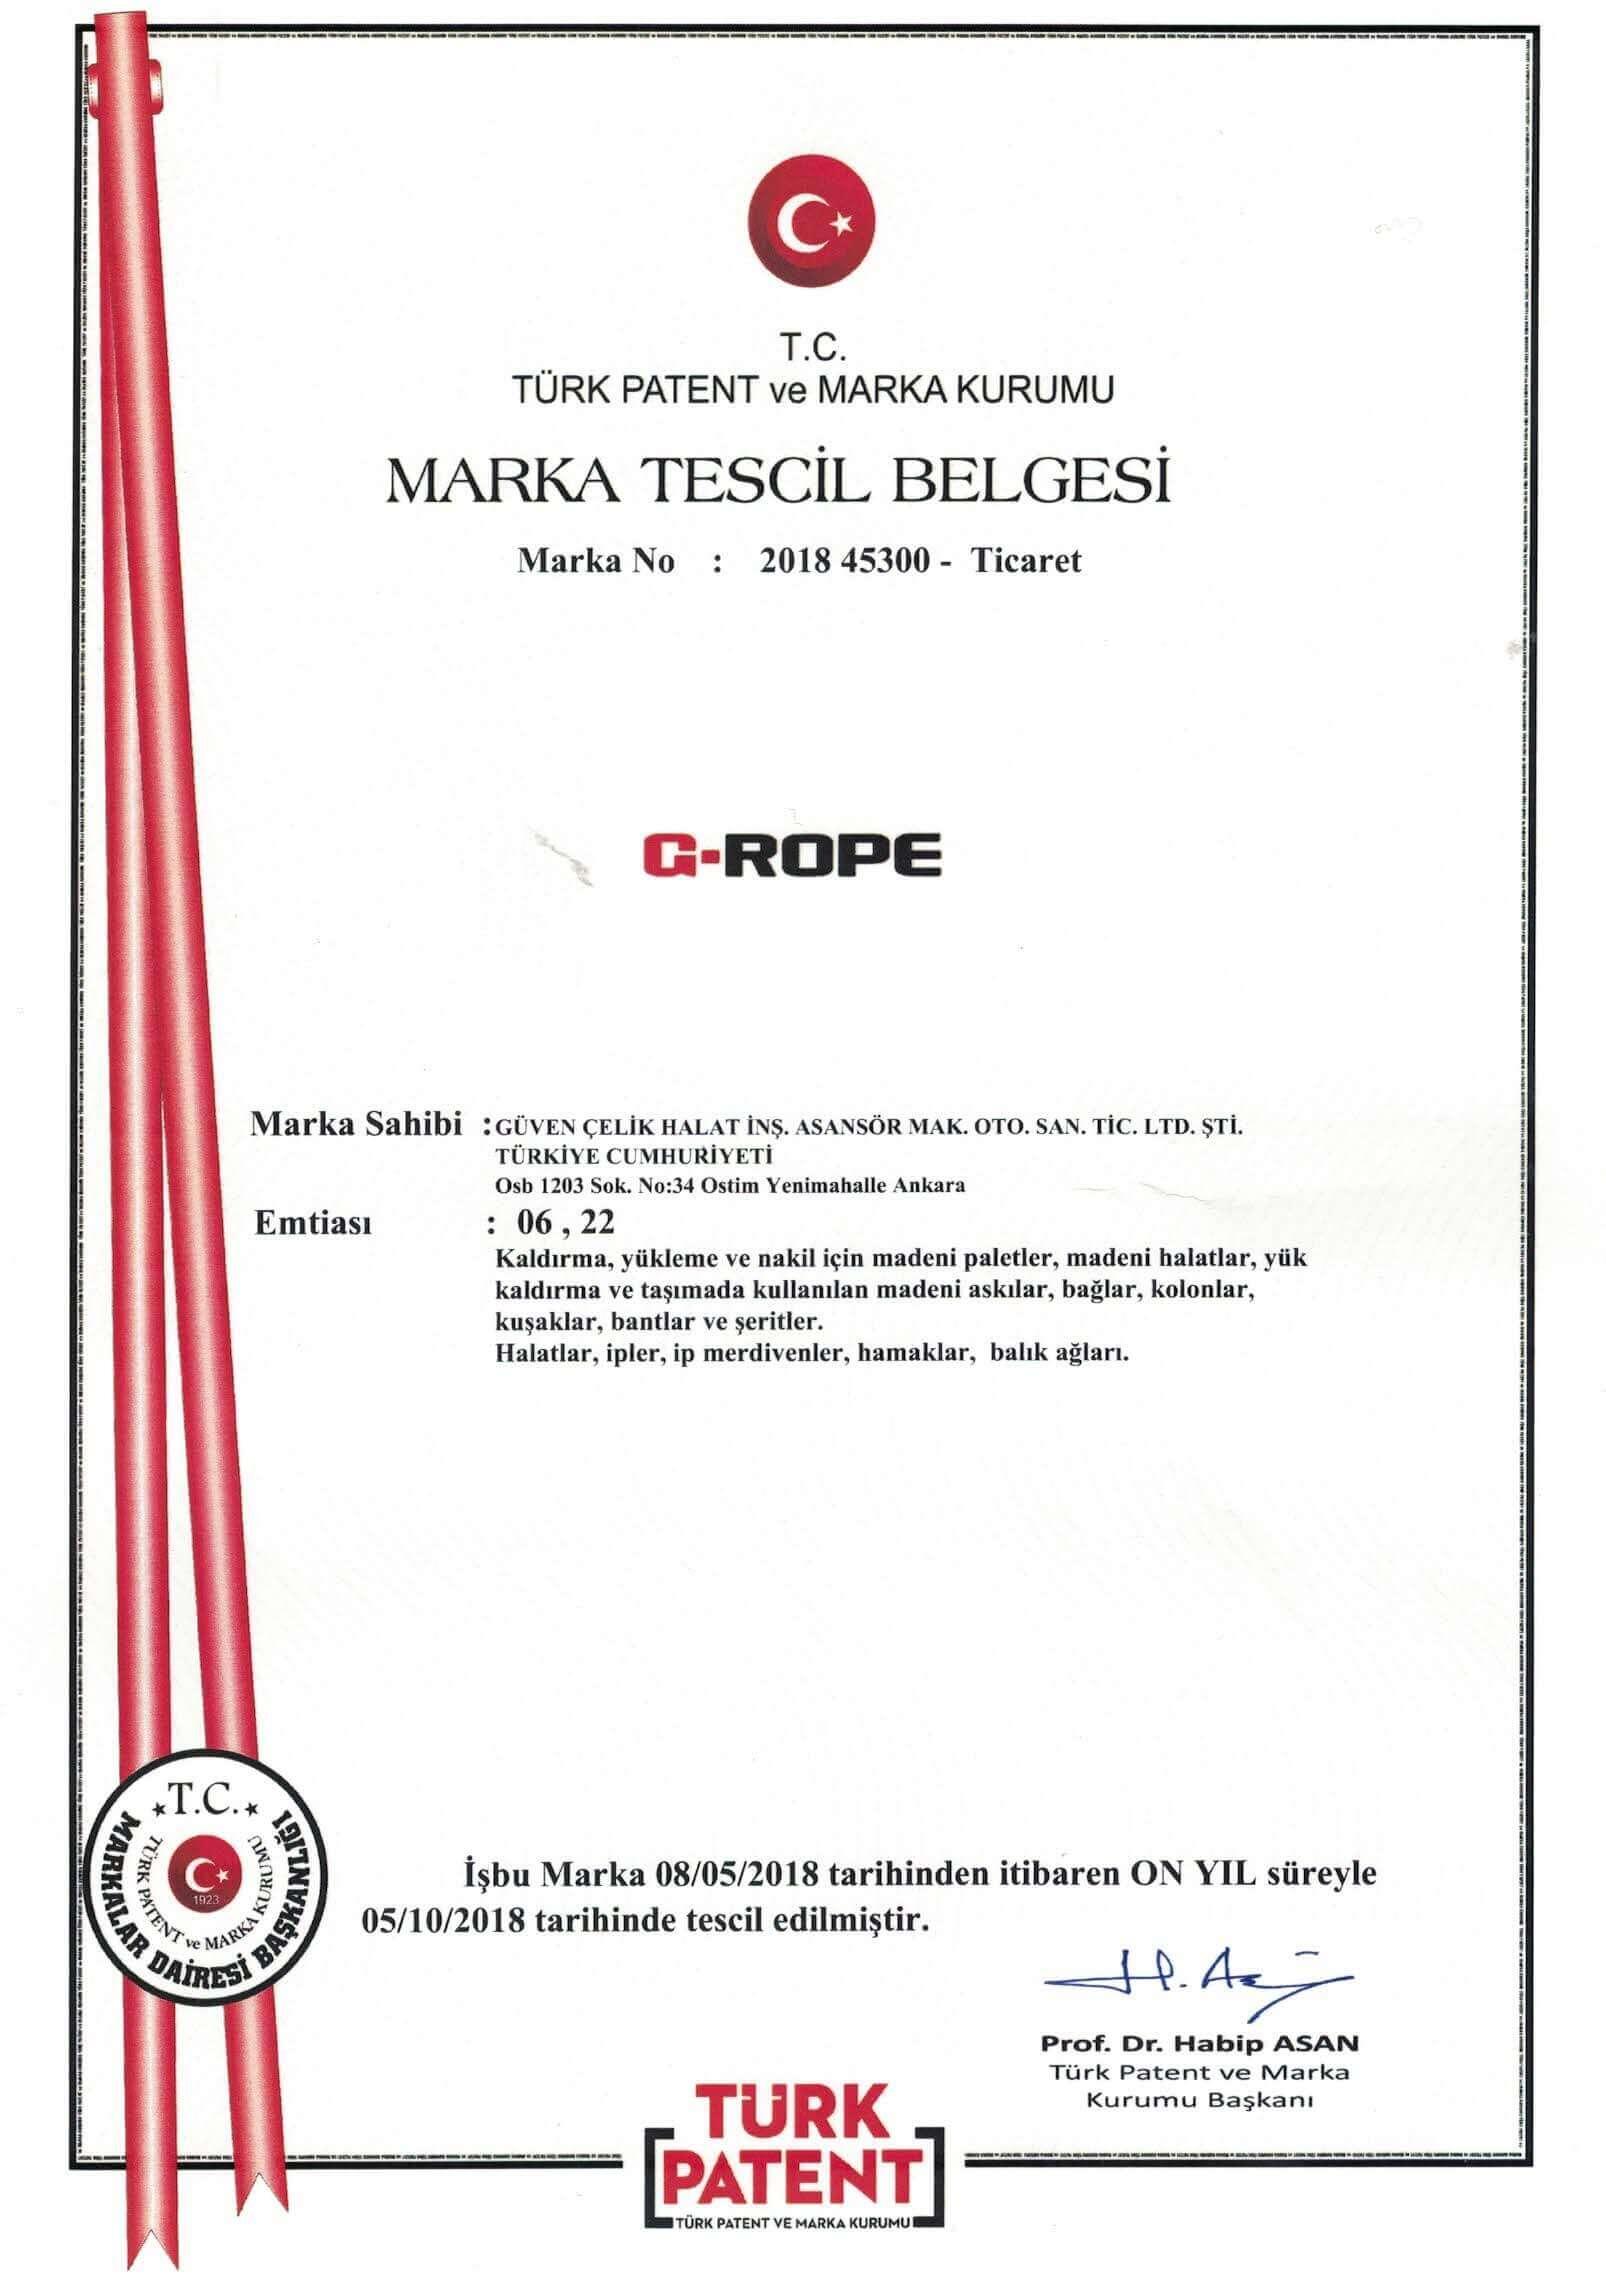 Marka Tescil Belgesi 3